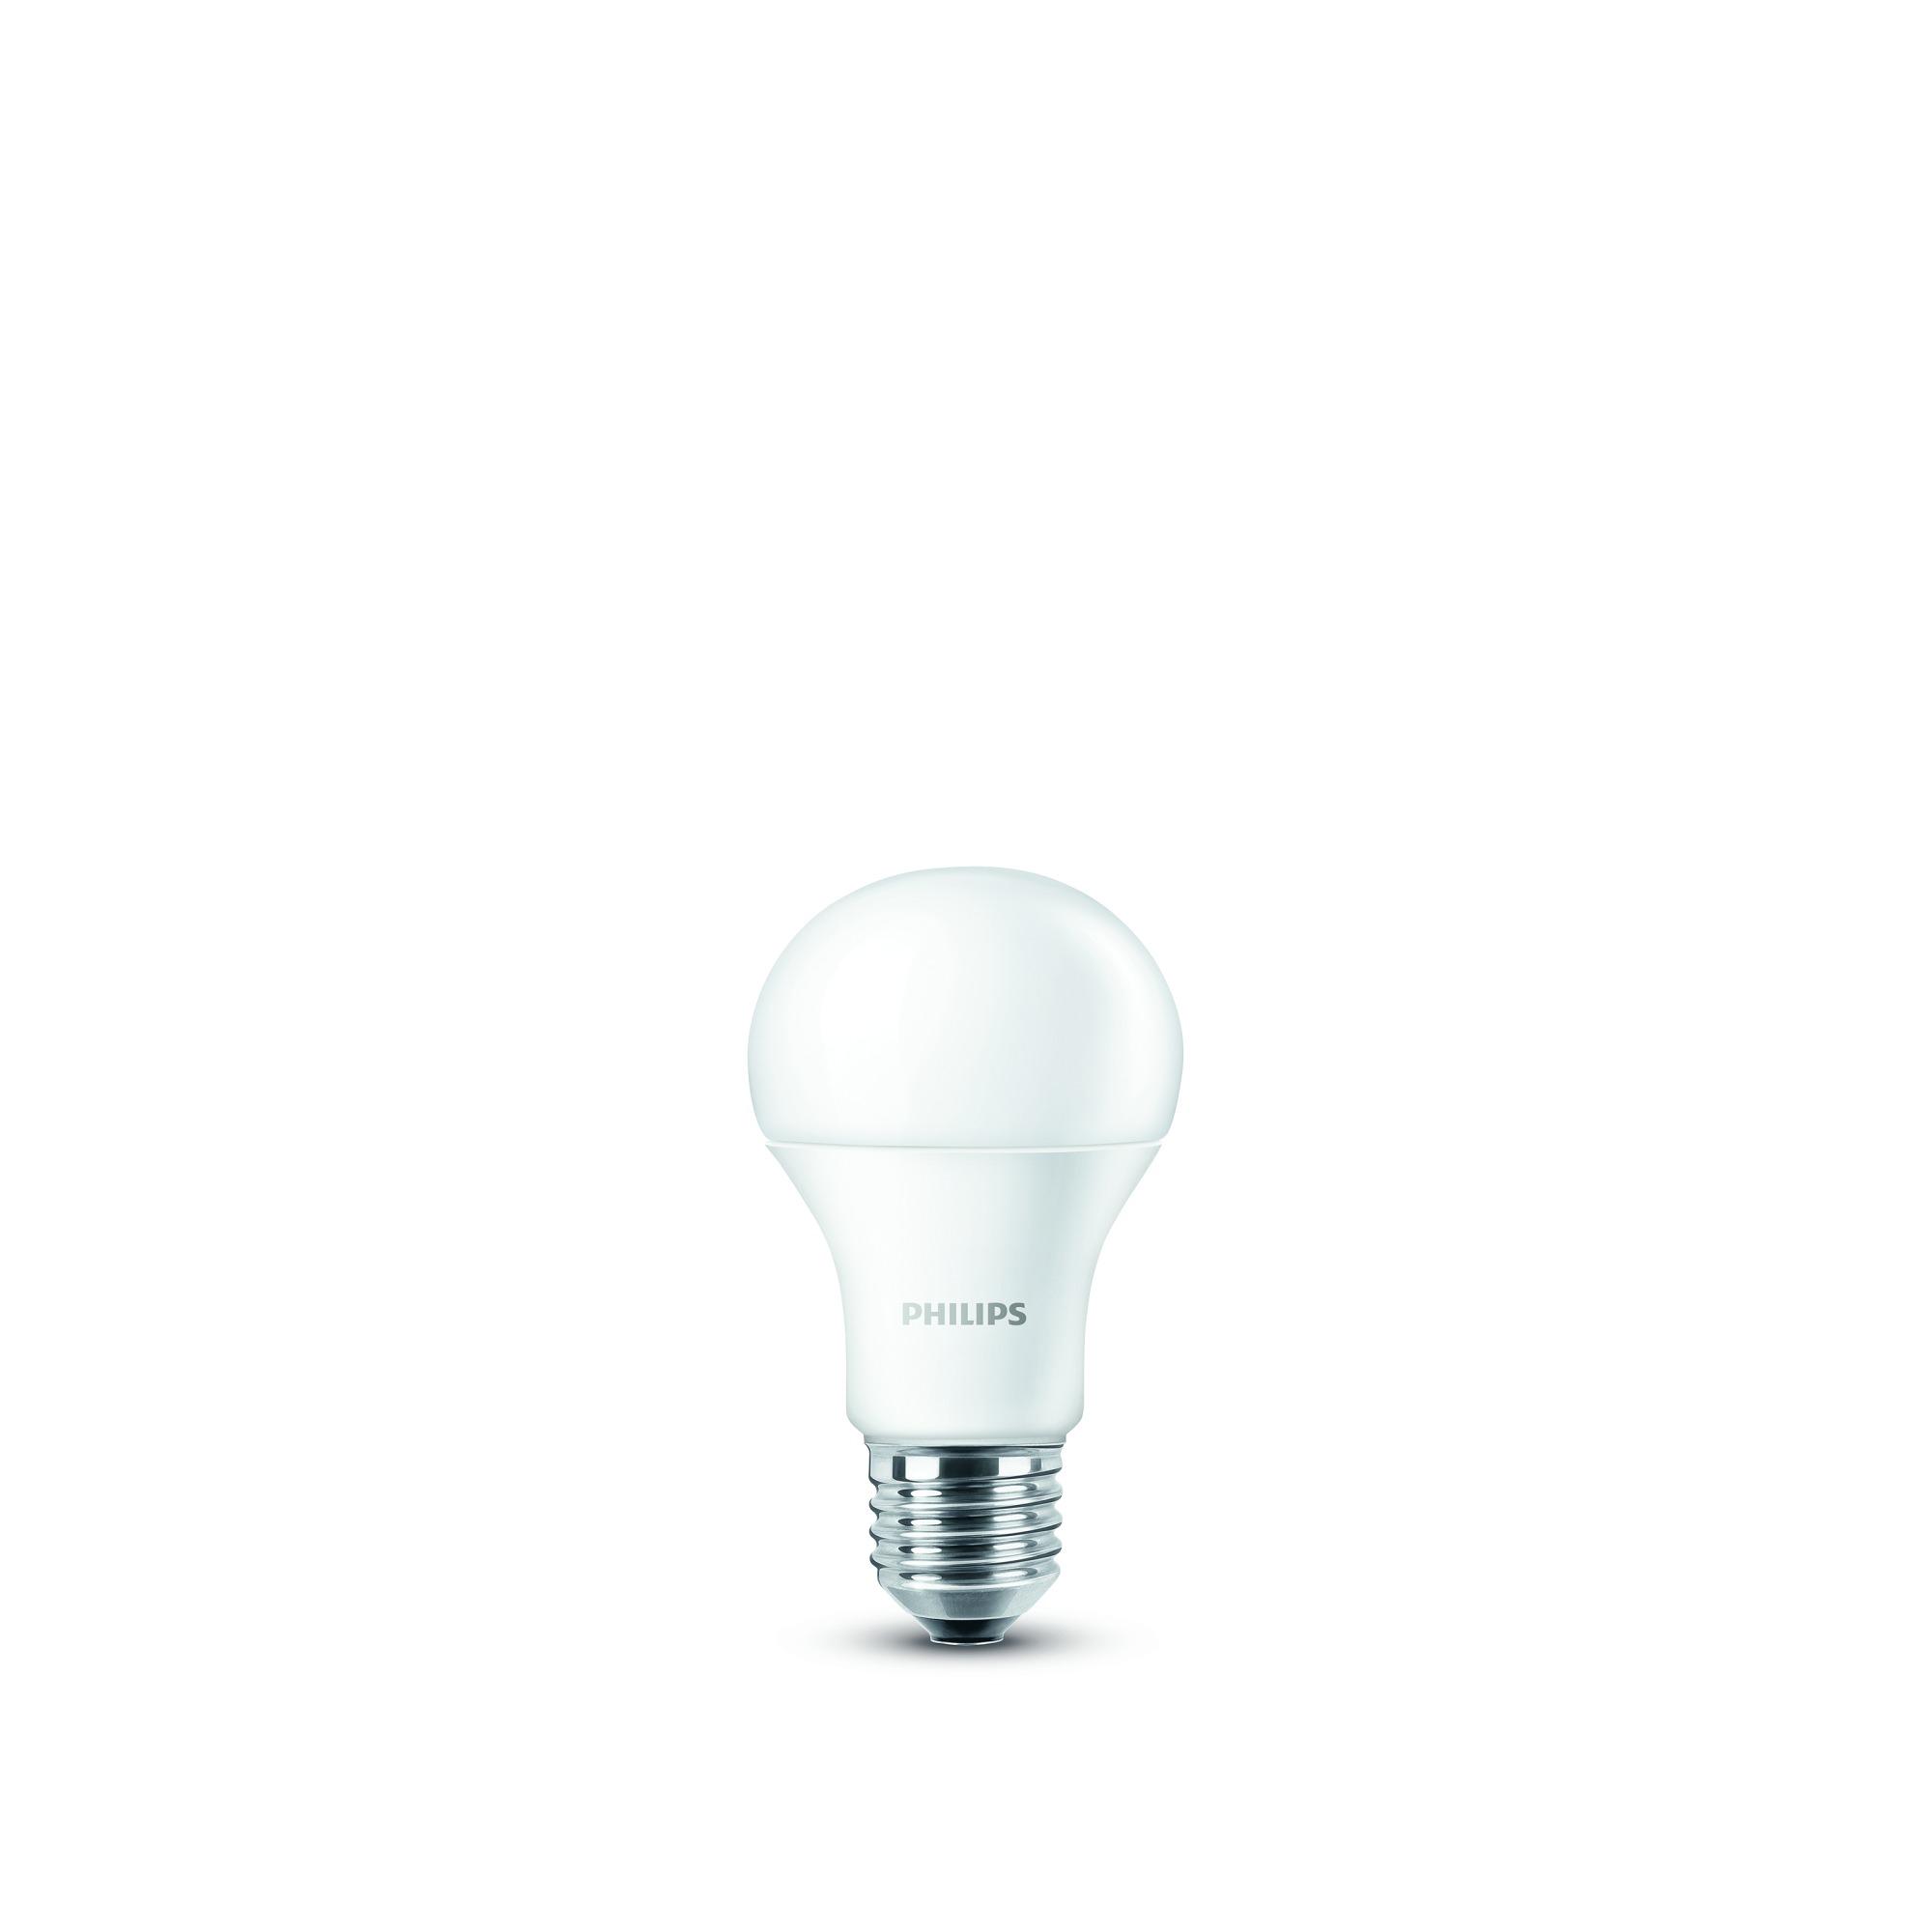 philips led peerlamp e27 1521 lumen 13 w 100w mat alle. Black Bedroom Furniture Sets. Home Design Ideas